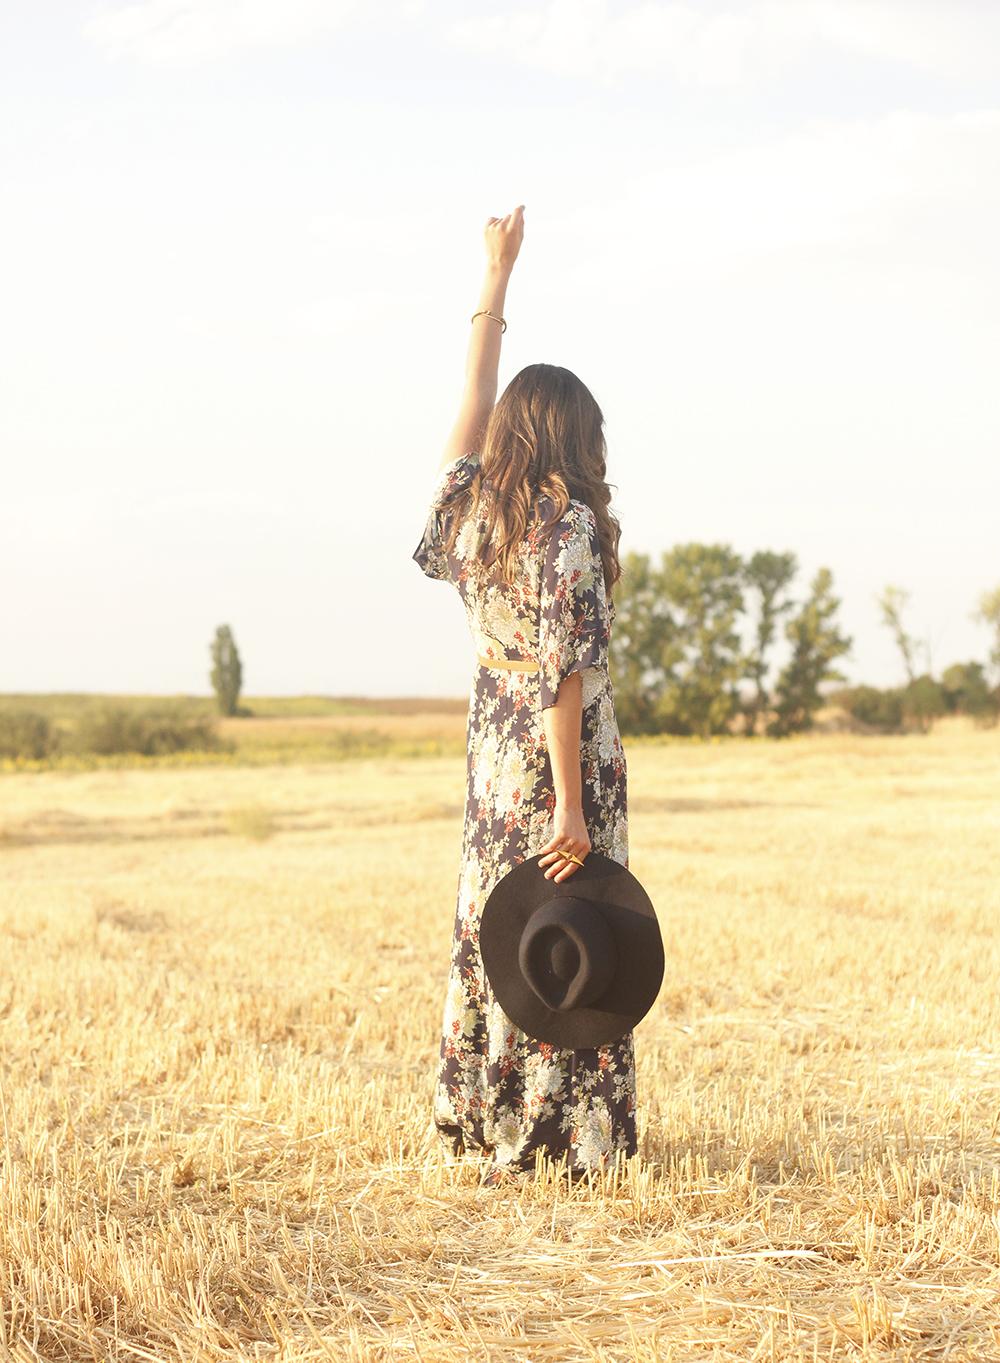 Maxi floral print dress uterqüe blue hat sunnies countryside summer outfit flat sandals massimo dutti14